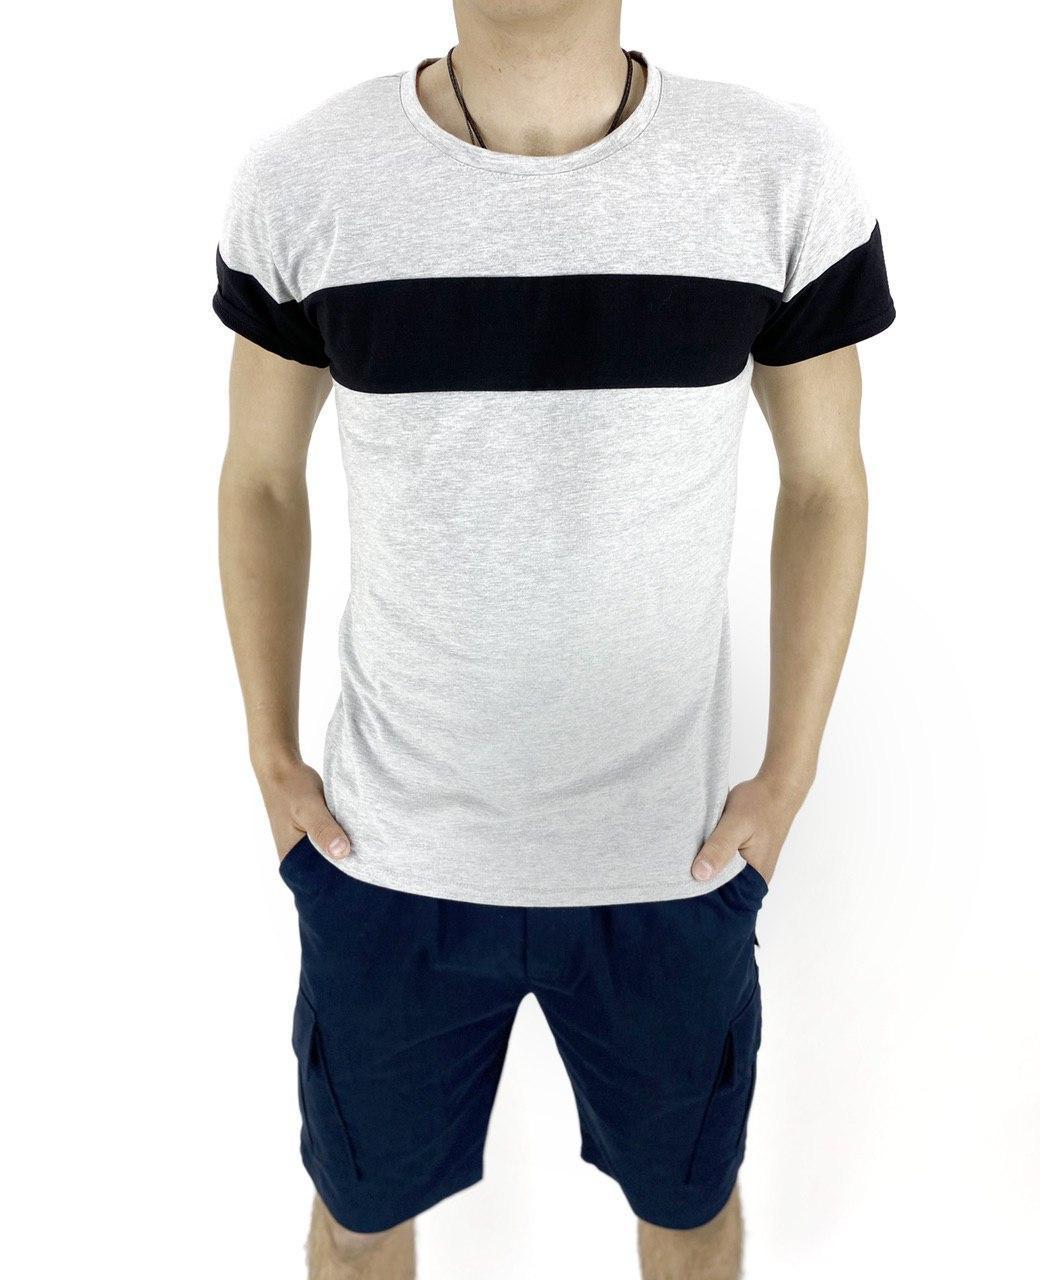 Комплект Футболка Intruder Color Stripe шорты Miami L Темно-синий с серым (Kom 1589370633/ 3)